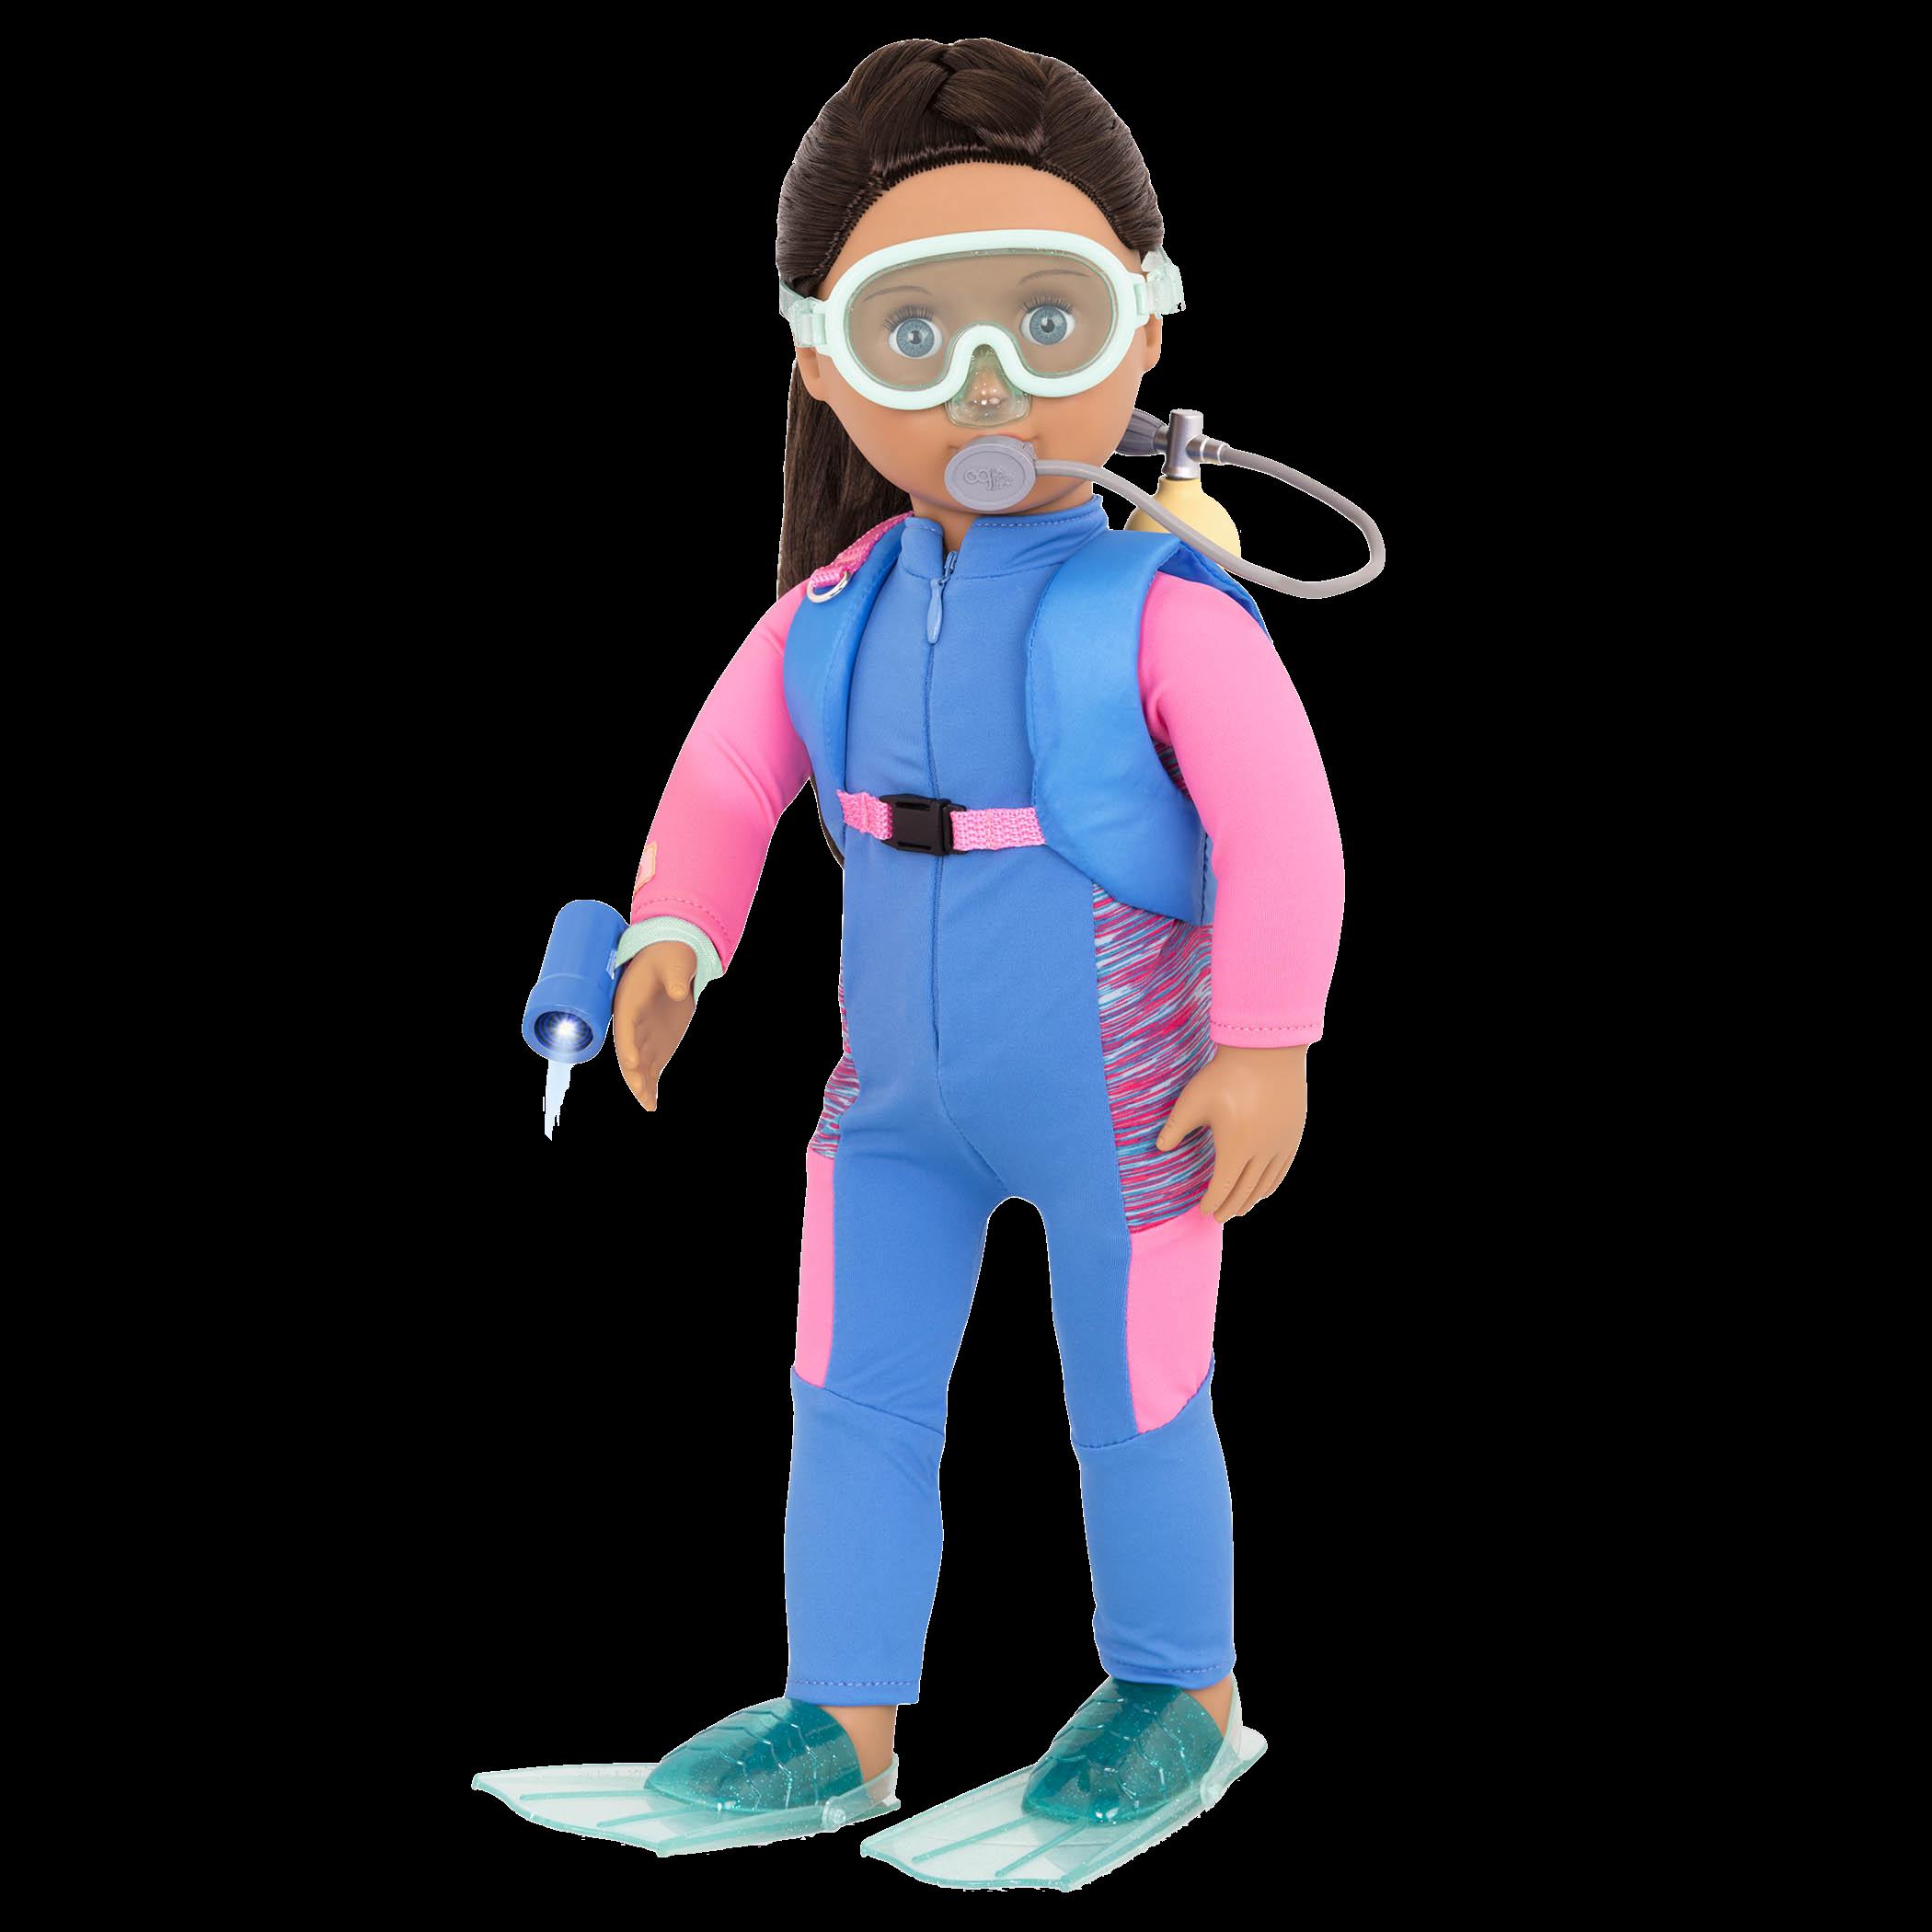 Annika 18-inch Marine Biologist Doll